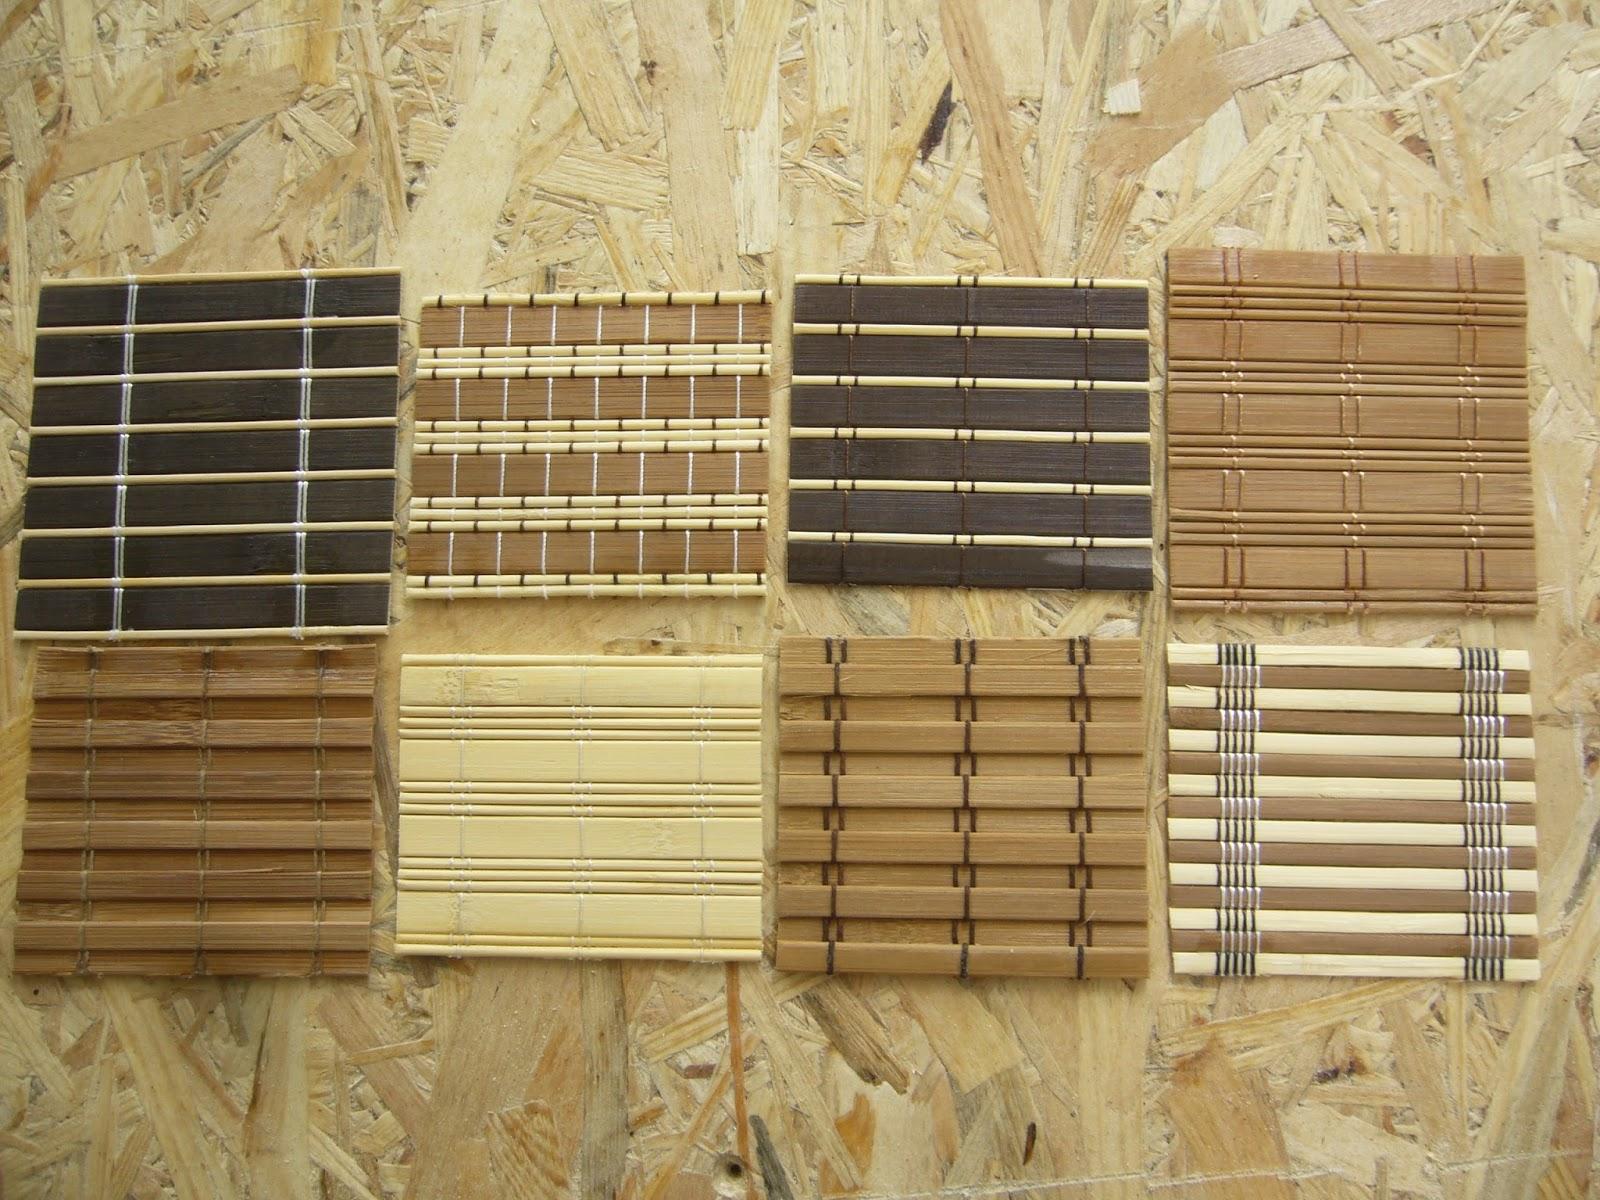 indywidualne rolety bambusowe czerwca 2015. Black Bedroom Furniture Sets. Home Design Ideas